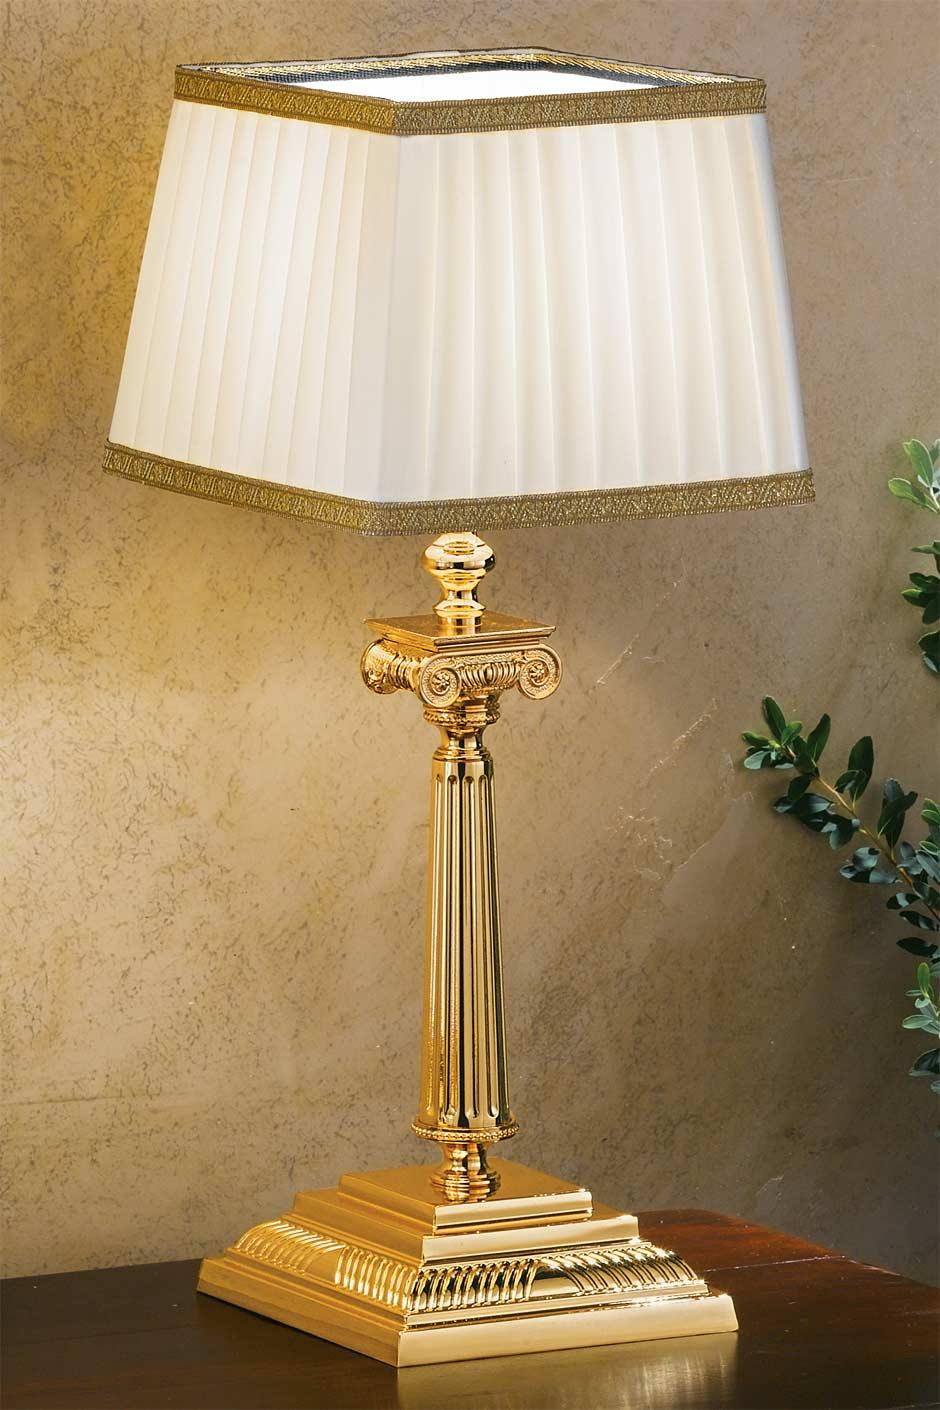 petite lampe bronze dor pied carr masiero sp cialiste. Black Bedroom Furniture Sets. Home Design Ideas